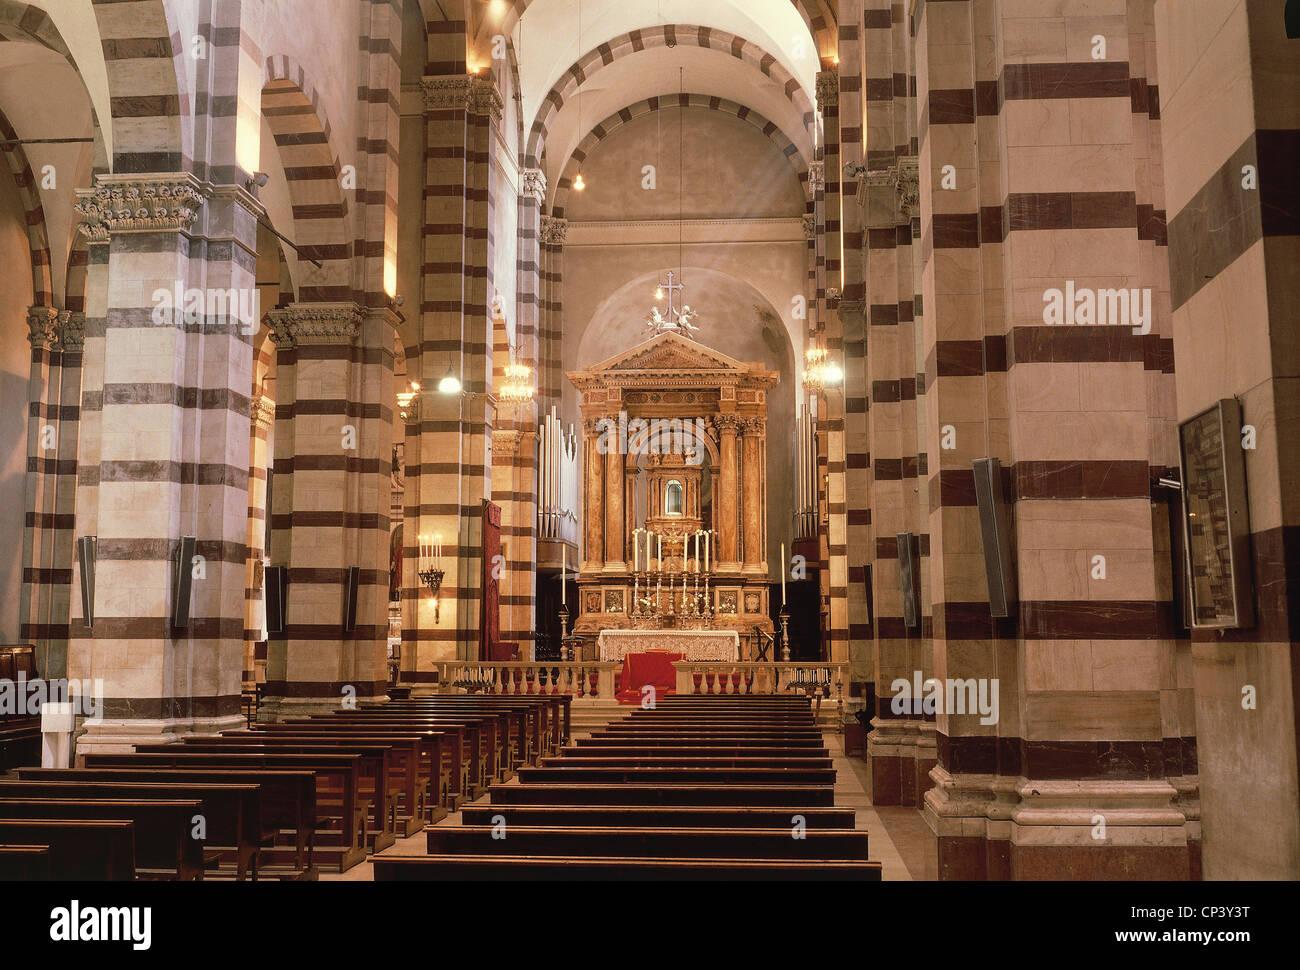 Tuscany - Grosseto. The Cathedral of San Lorenzo. Interior. Architect of Sozzo Rustichino, 1294-1302. - Stock Image